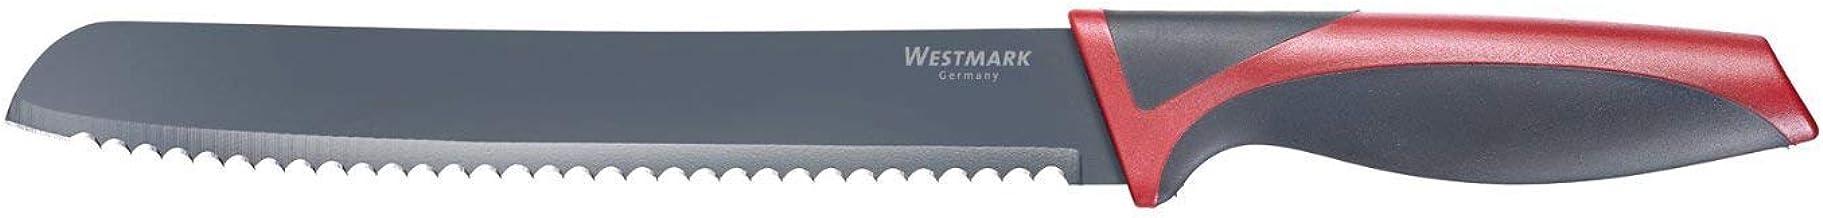 Westmark 4004094145582 Bread Knife, Blade 20 cm, Silver, 4004094145582